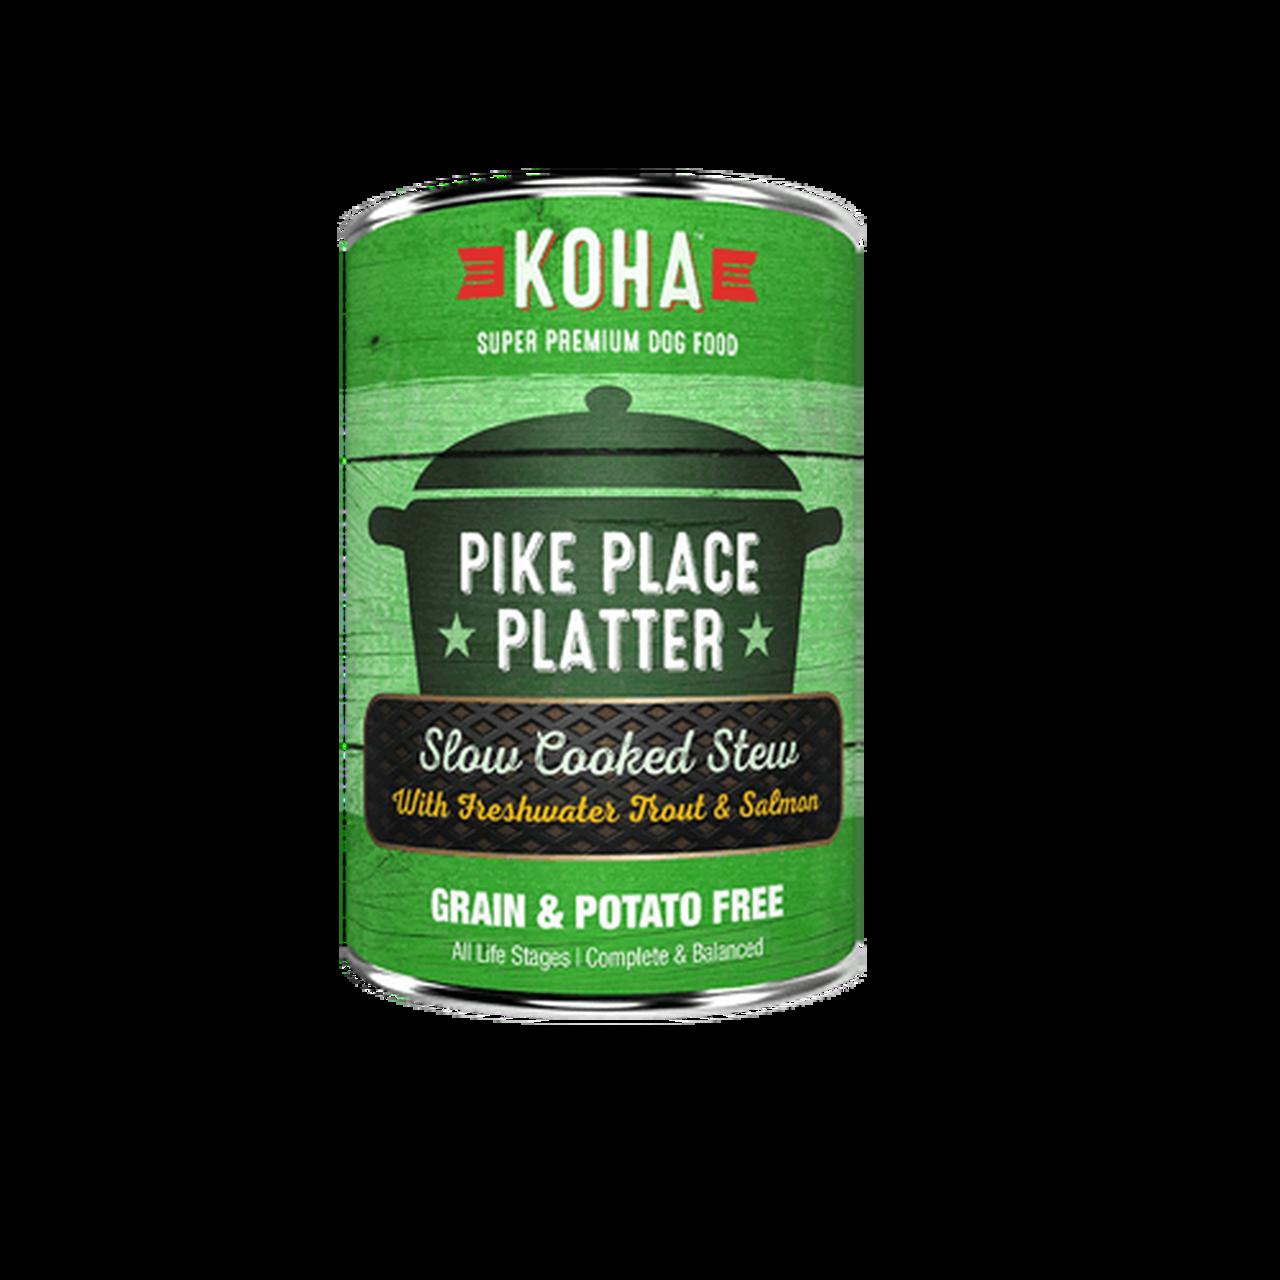 Koha Koha Dog Can Grain Free Pike Place Platter Trout Salmon 12.7 oz Product Image